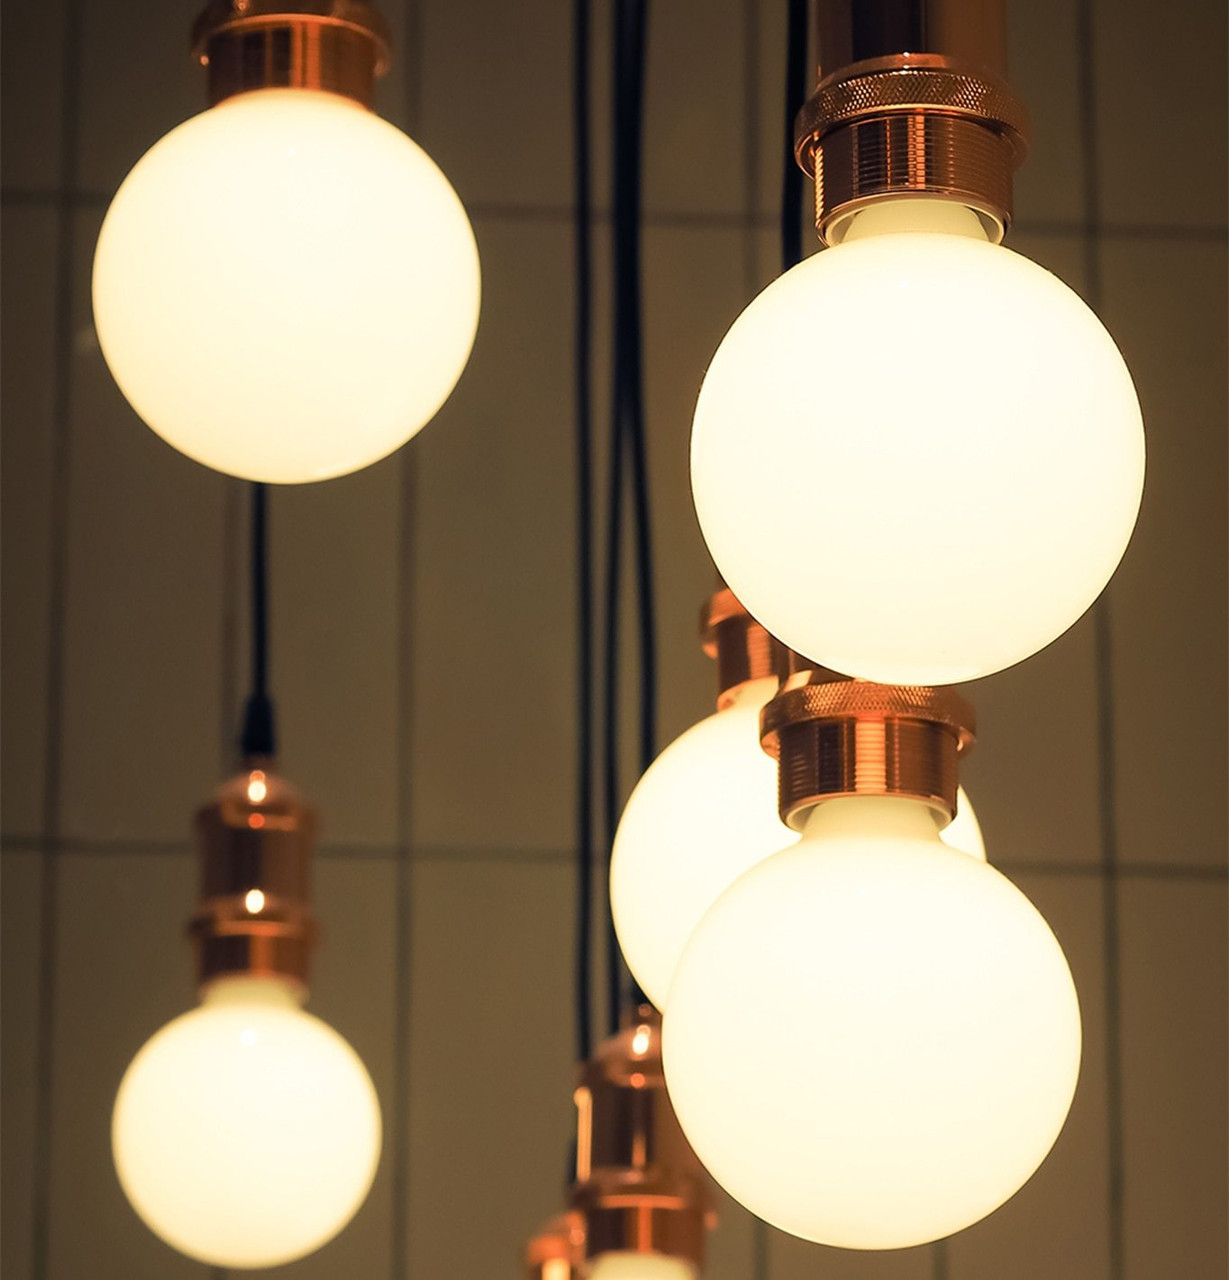 Crompton Lamps LED G95 B22 Light Bulbs